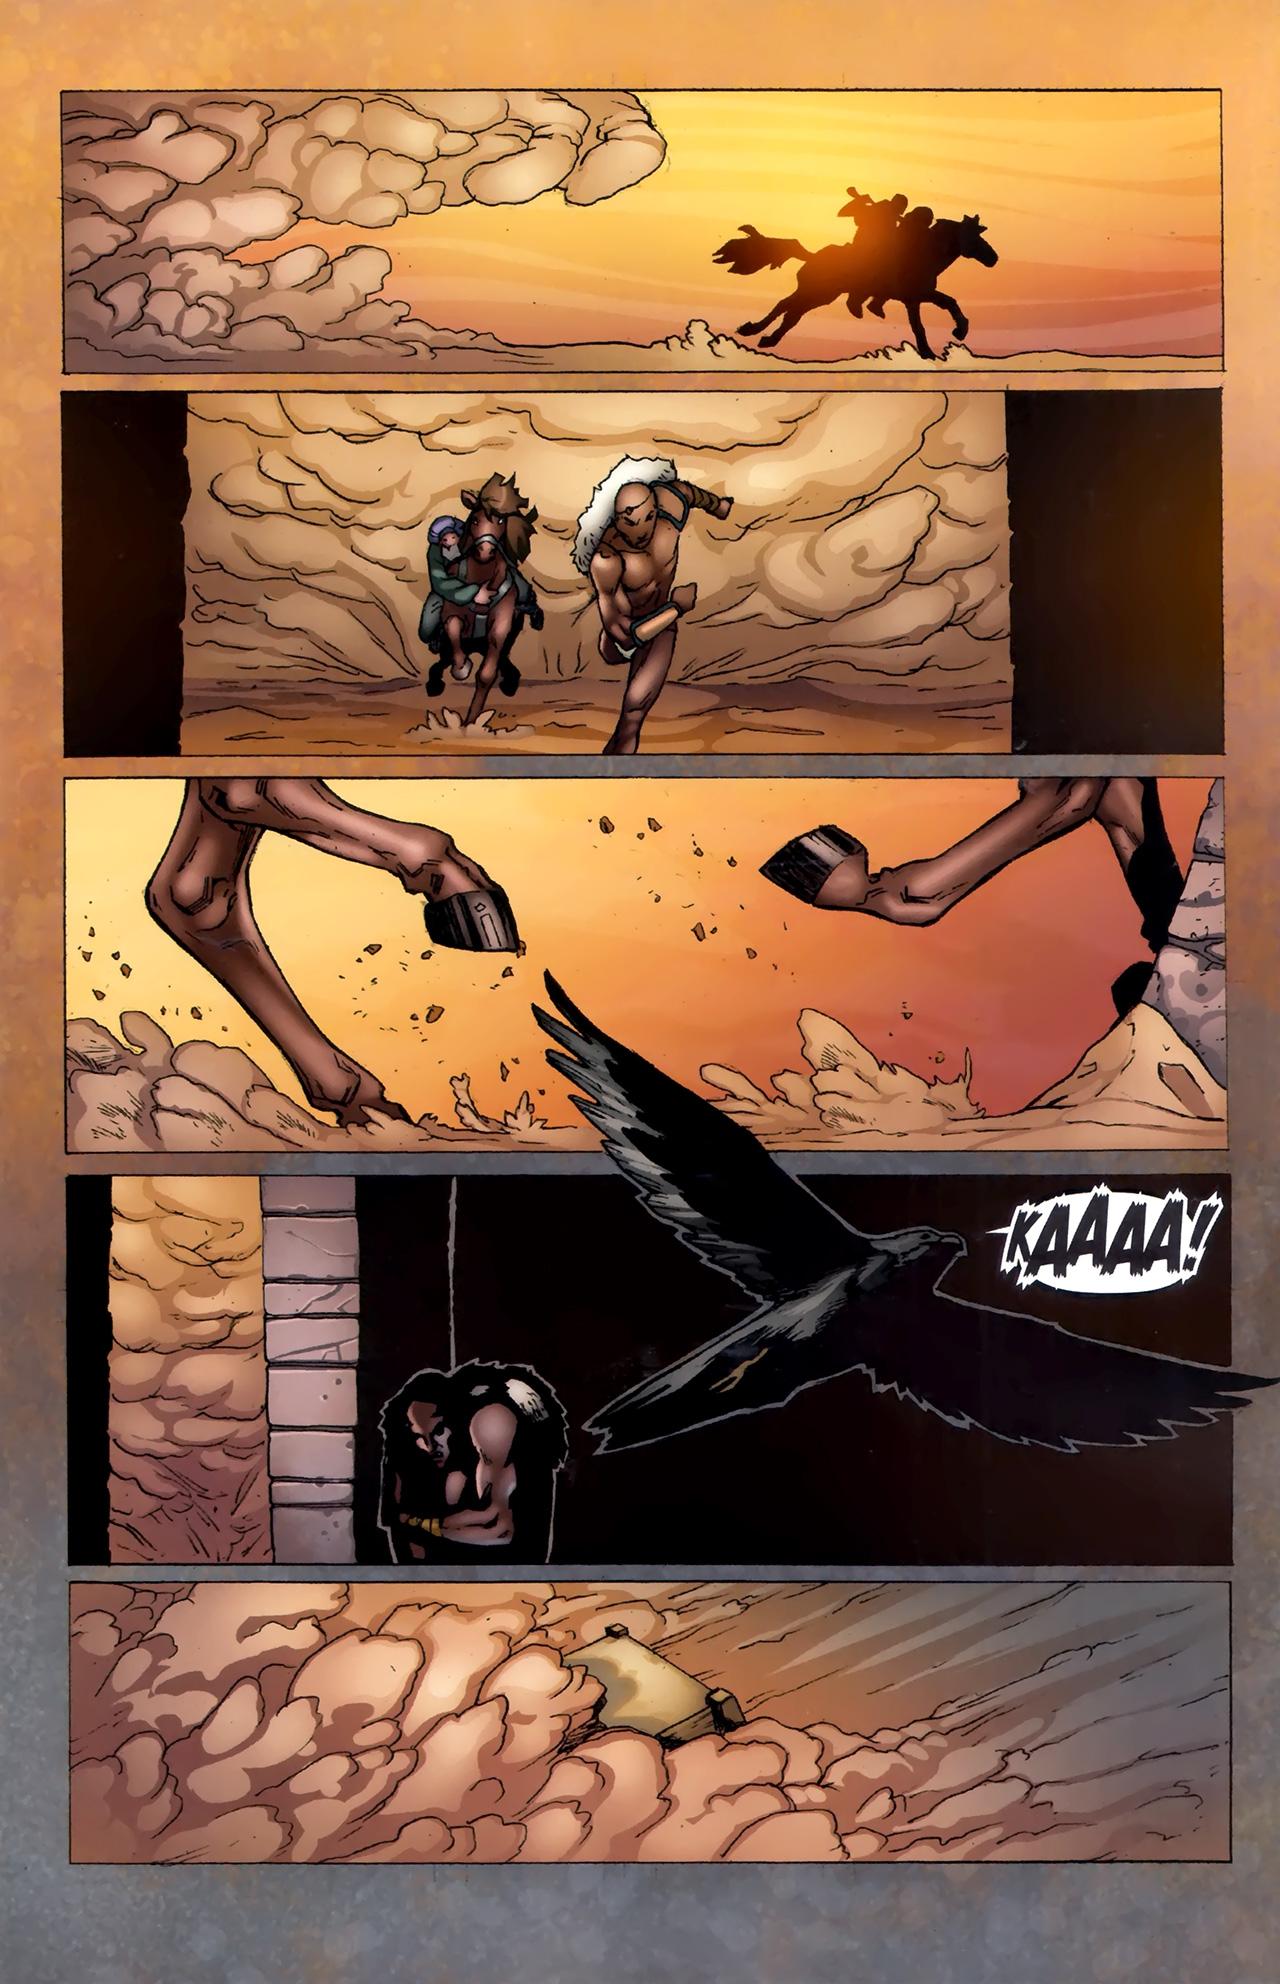 Read online 1001 Arabian Nights: The Adventures of Sinbad comic -  Issue #11 - 11